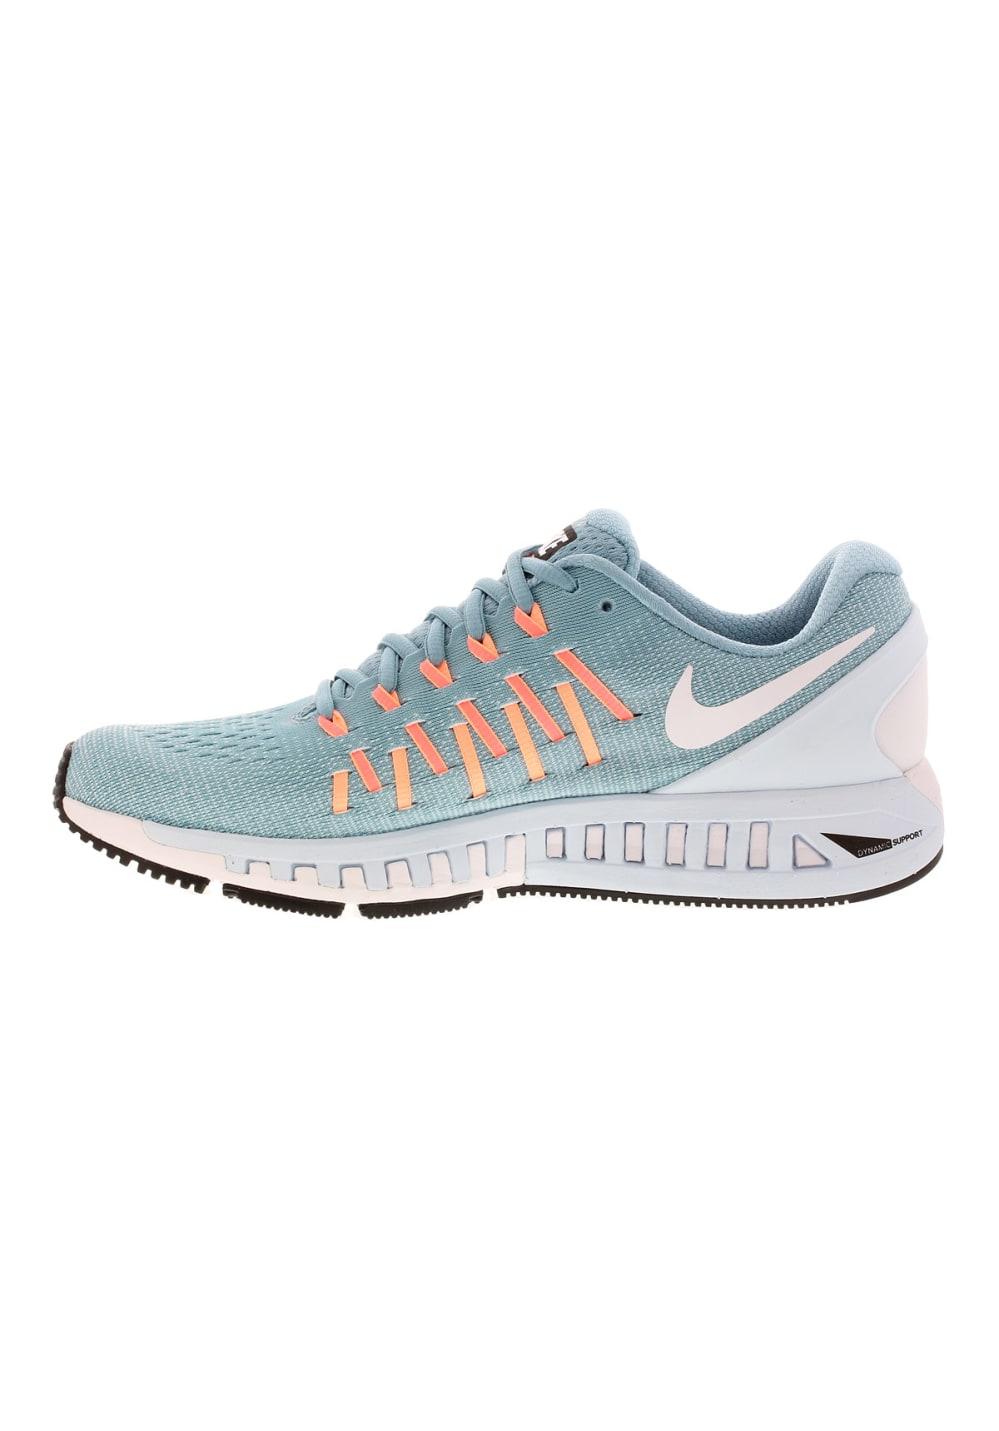 new product 715b9 027ef Next. -60%. Nike. Air Zoom Odyssey 2 - Laufschuhe für Damen. Regulärer  Preis  ...